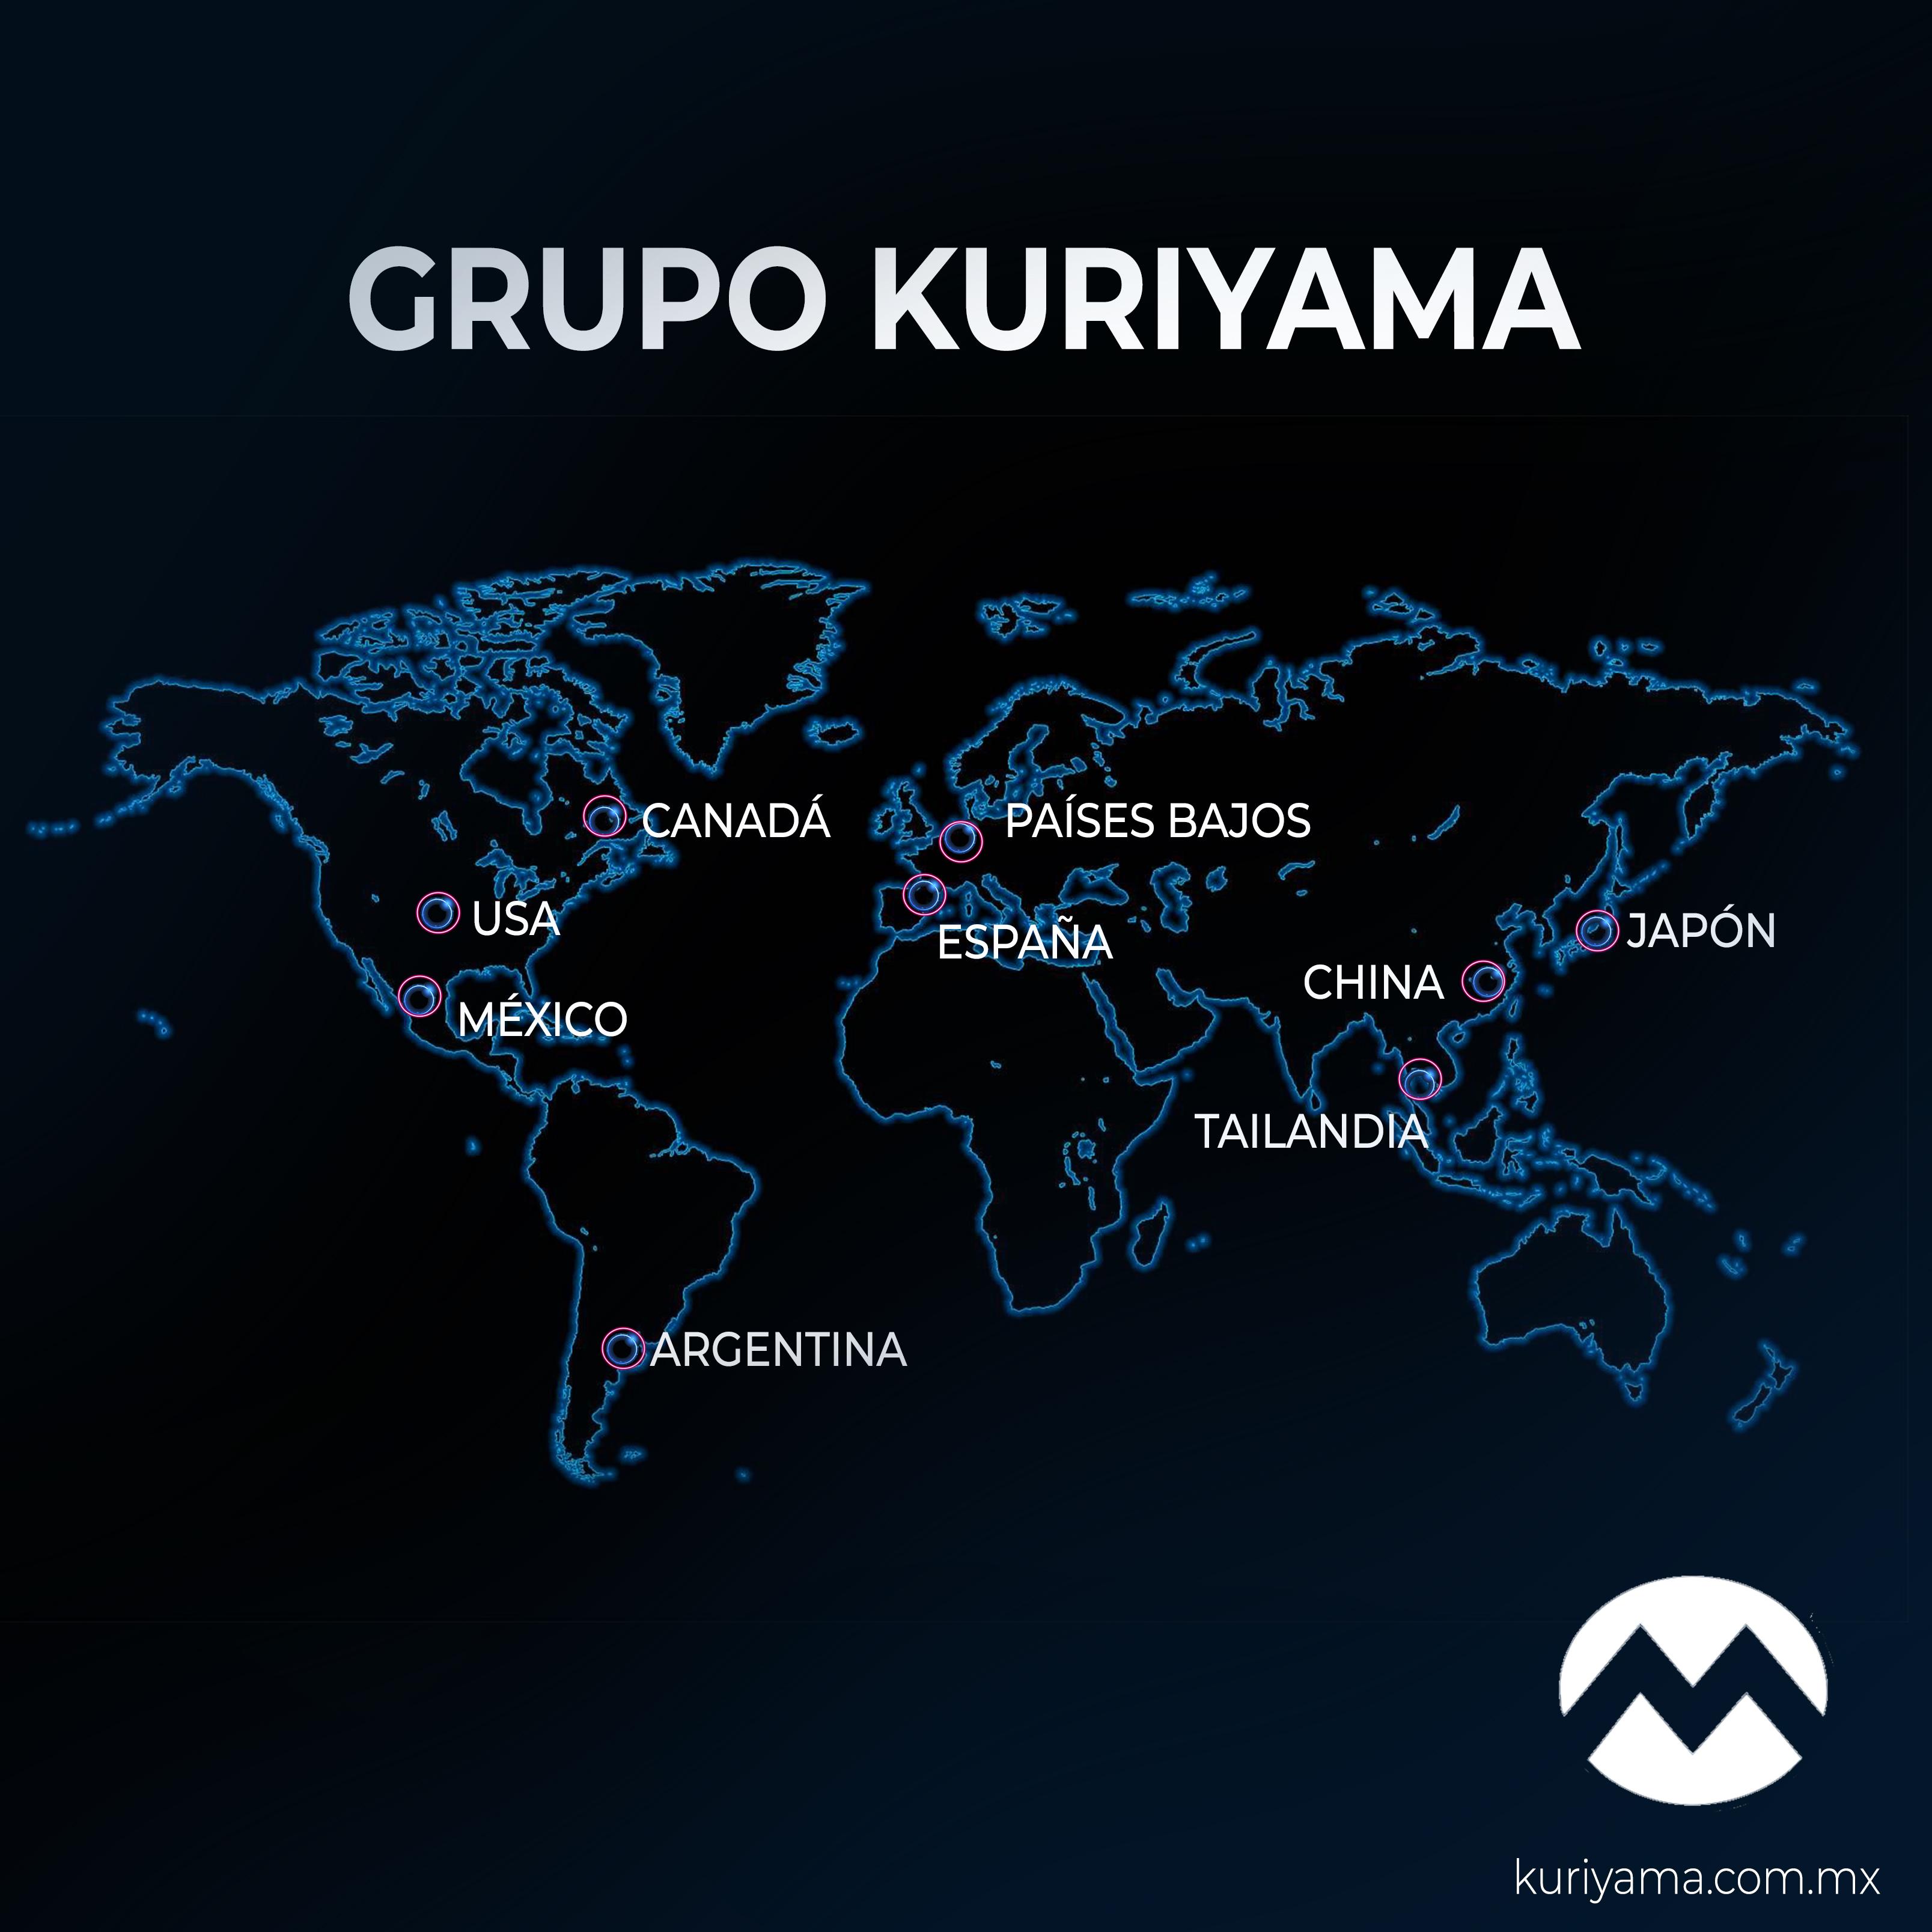 Aniversario 82 de Kuriyama